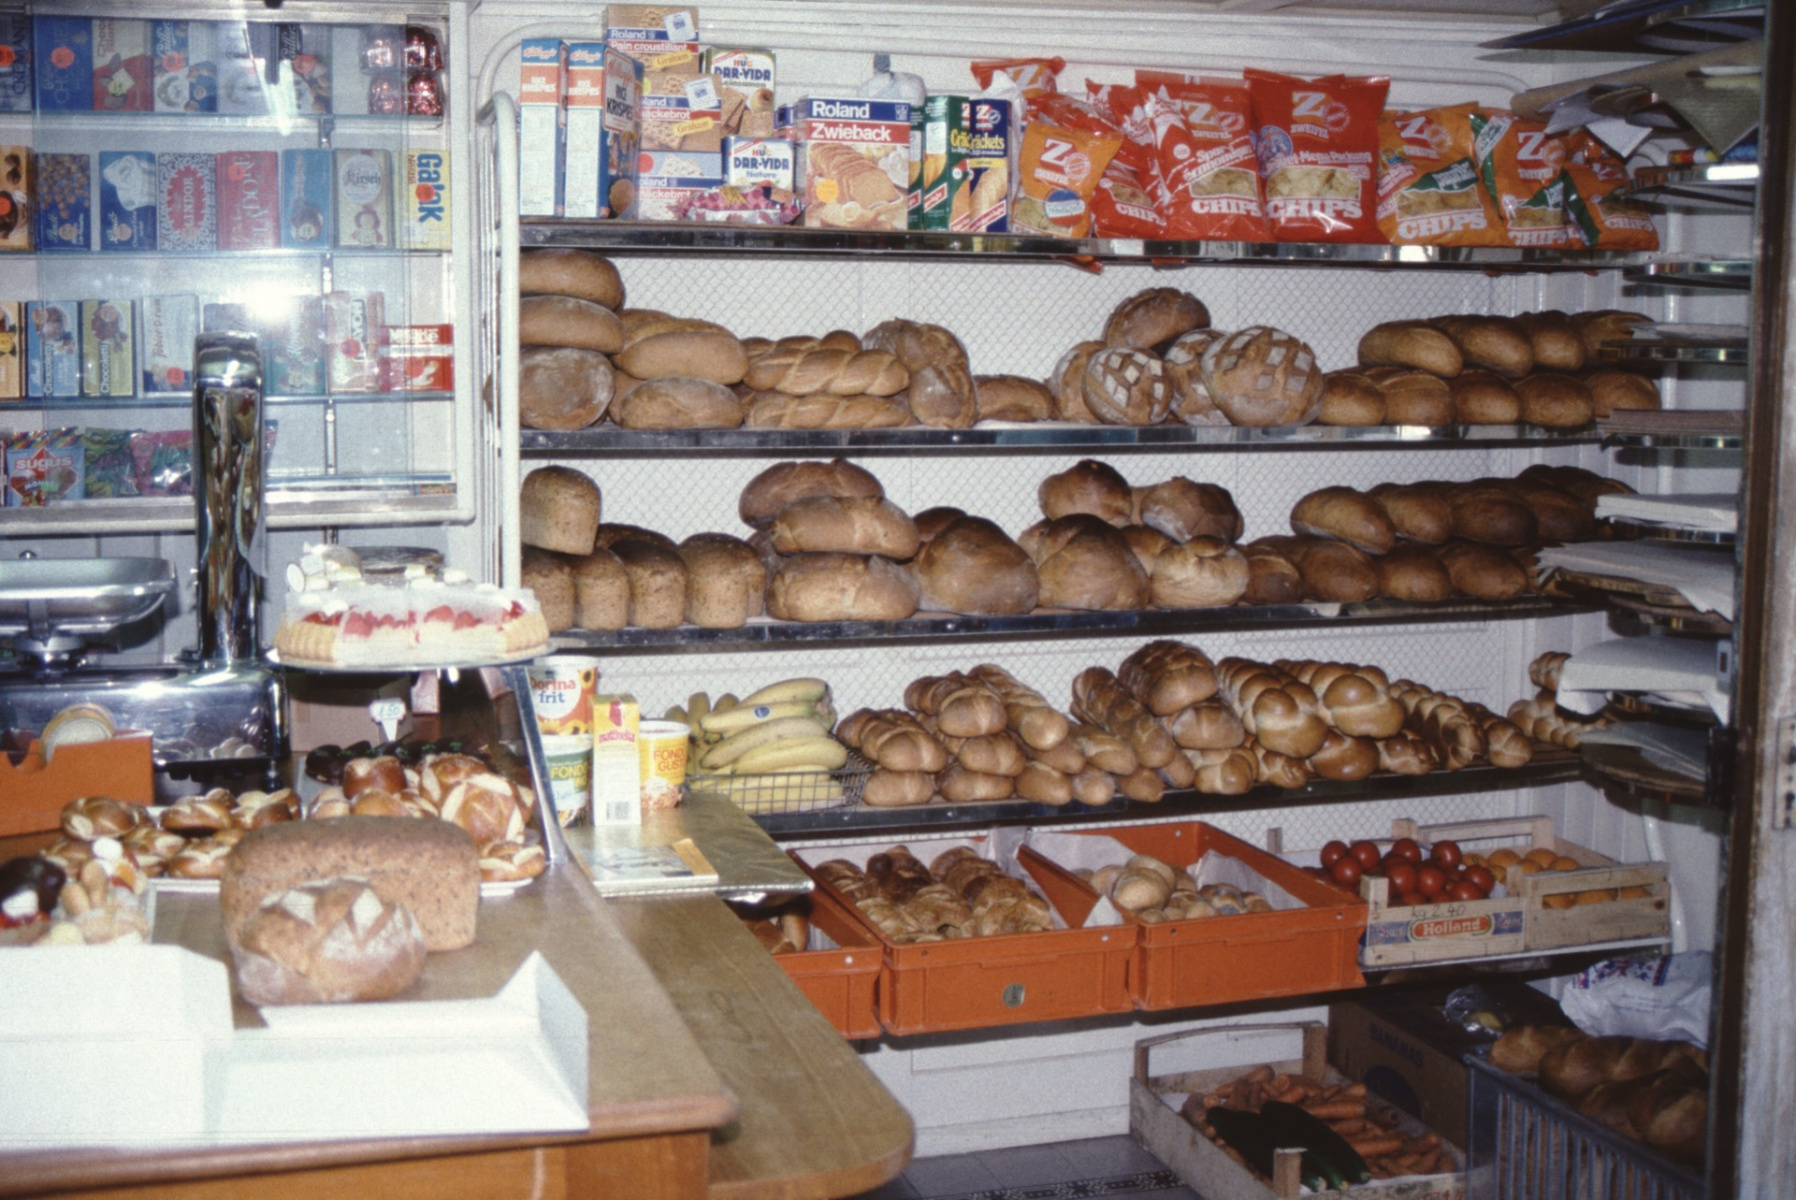 Bäckerei Meier, Laden